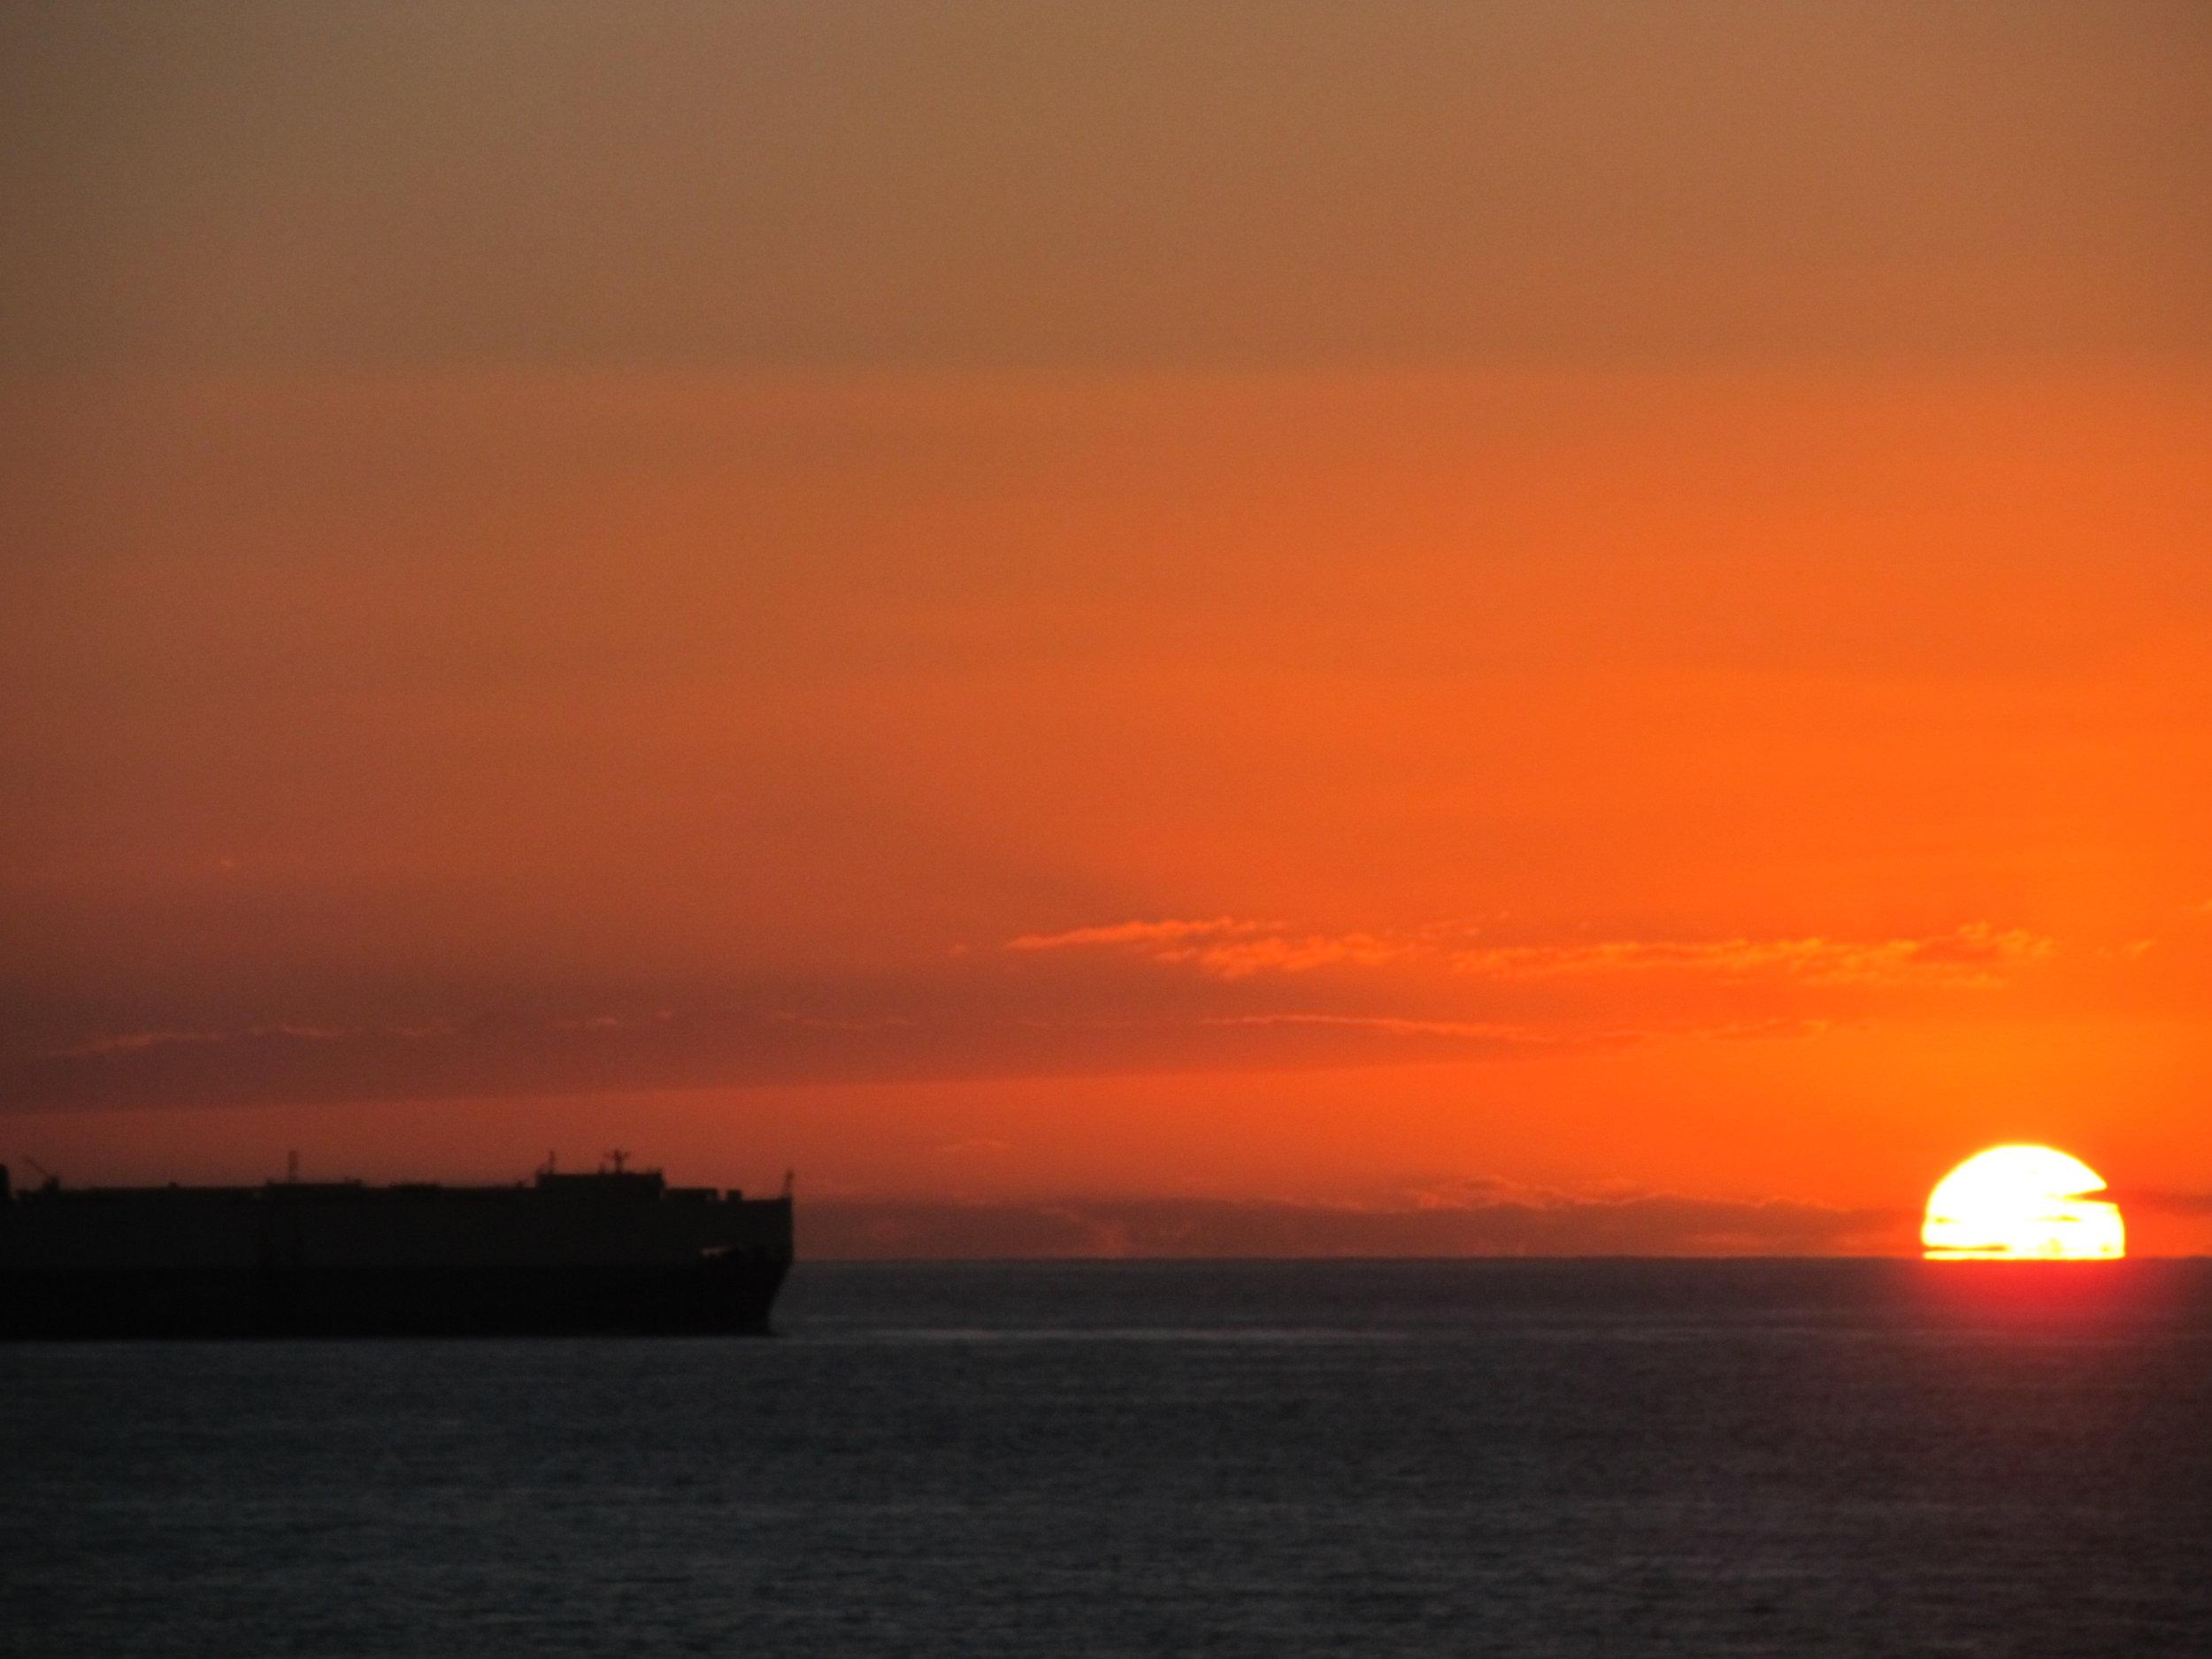 cargo ship at sunset